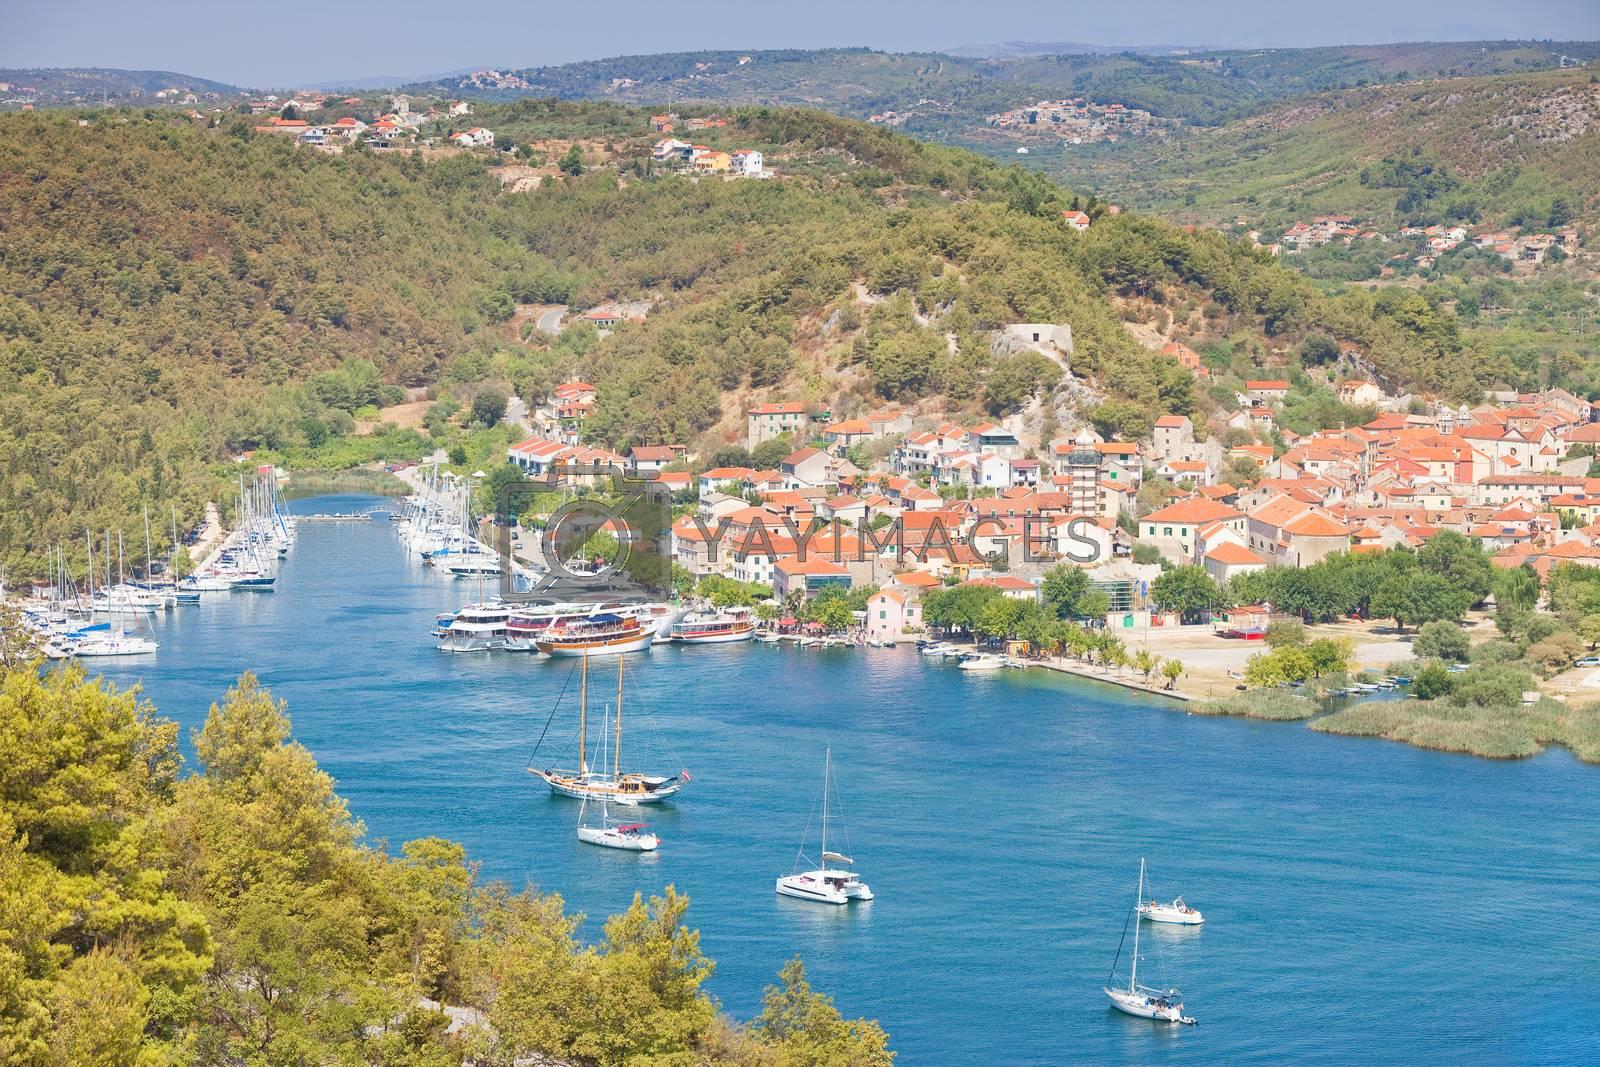 Skradin, Croatia, Europe - Visiting the the beautiful old town of Skradin